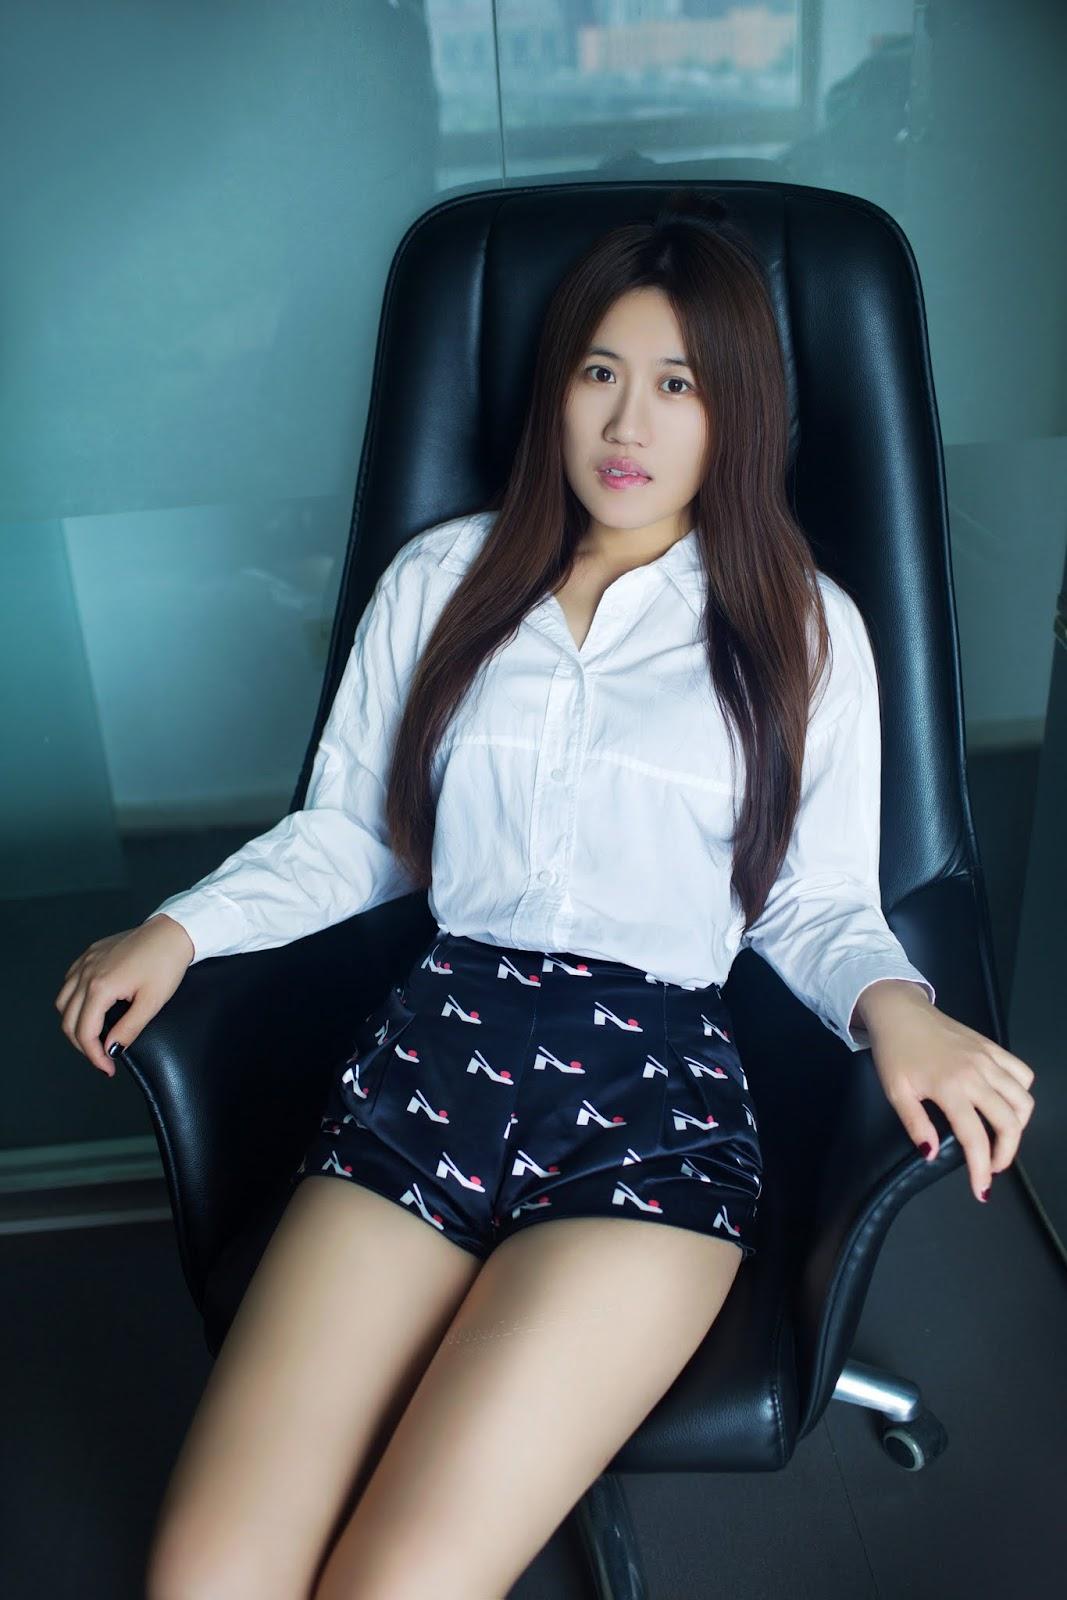 Jessica%2B%25284%2529 - TuiGirl No.60